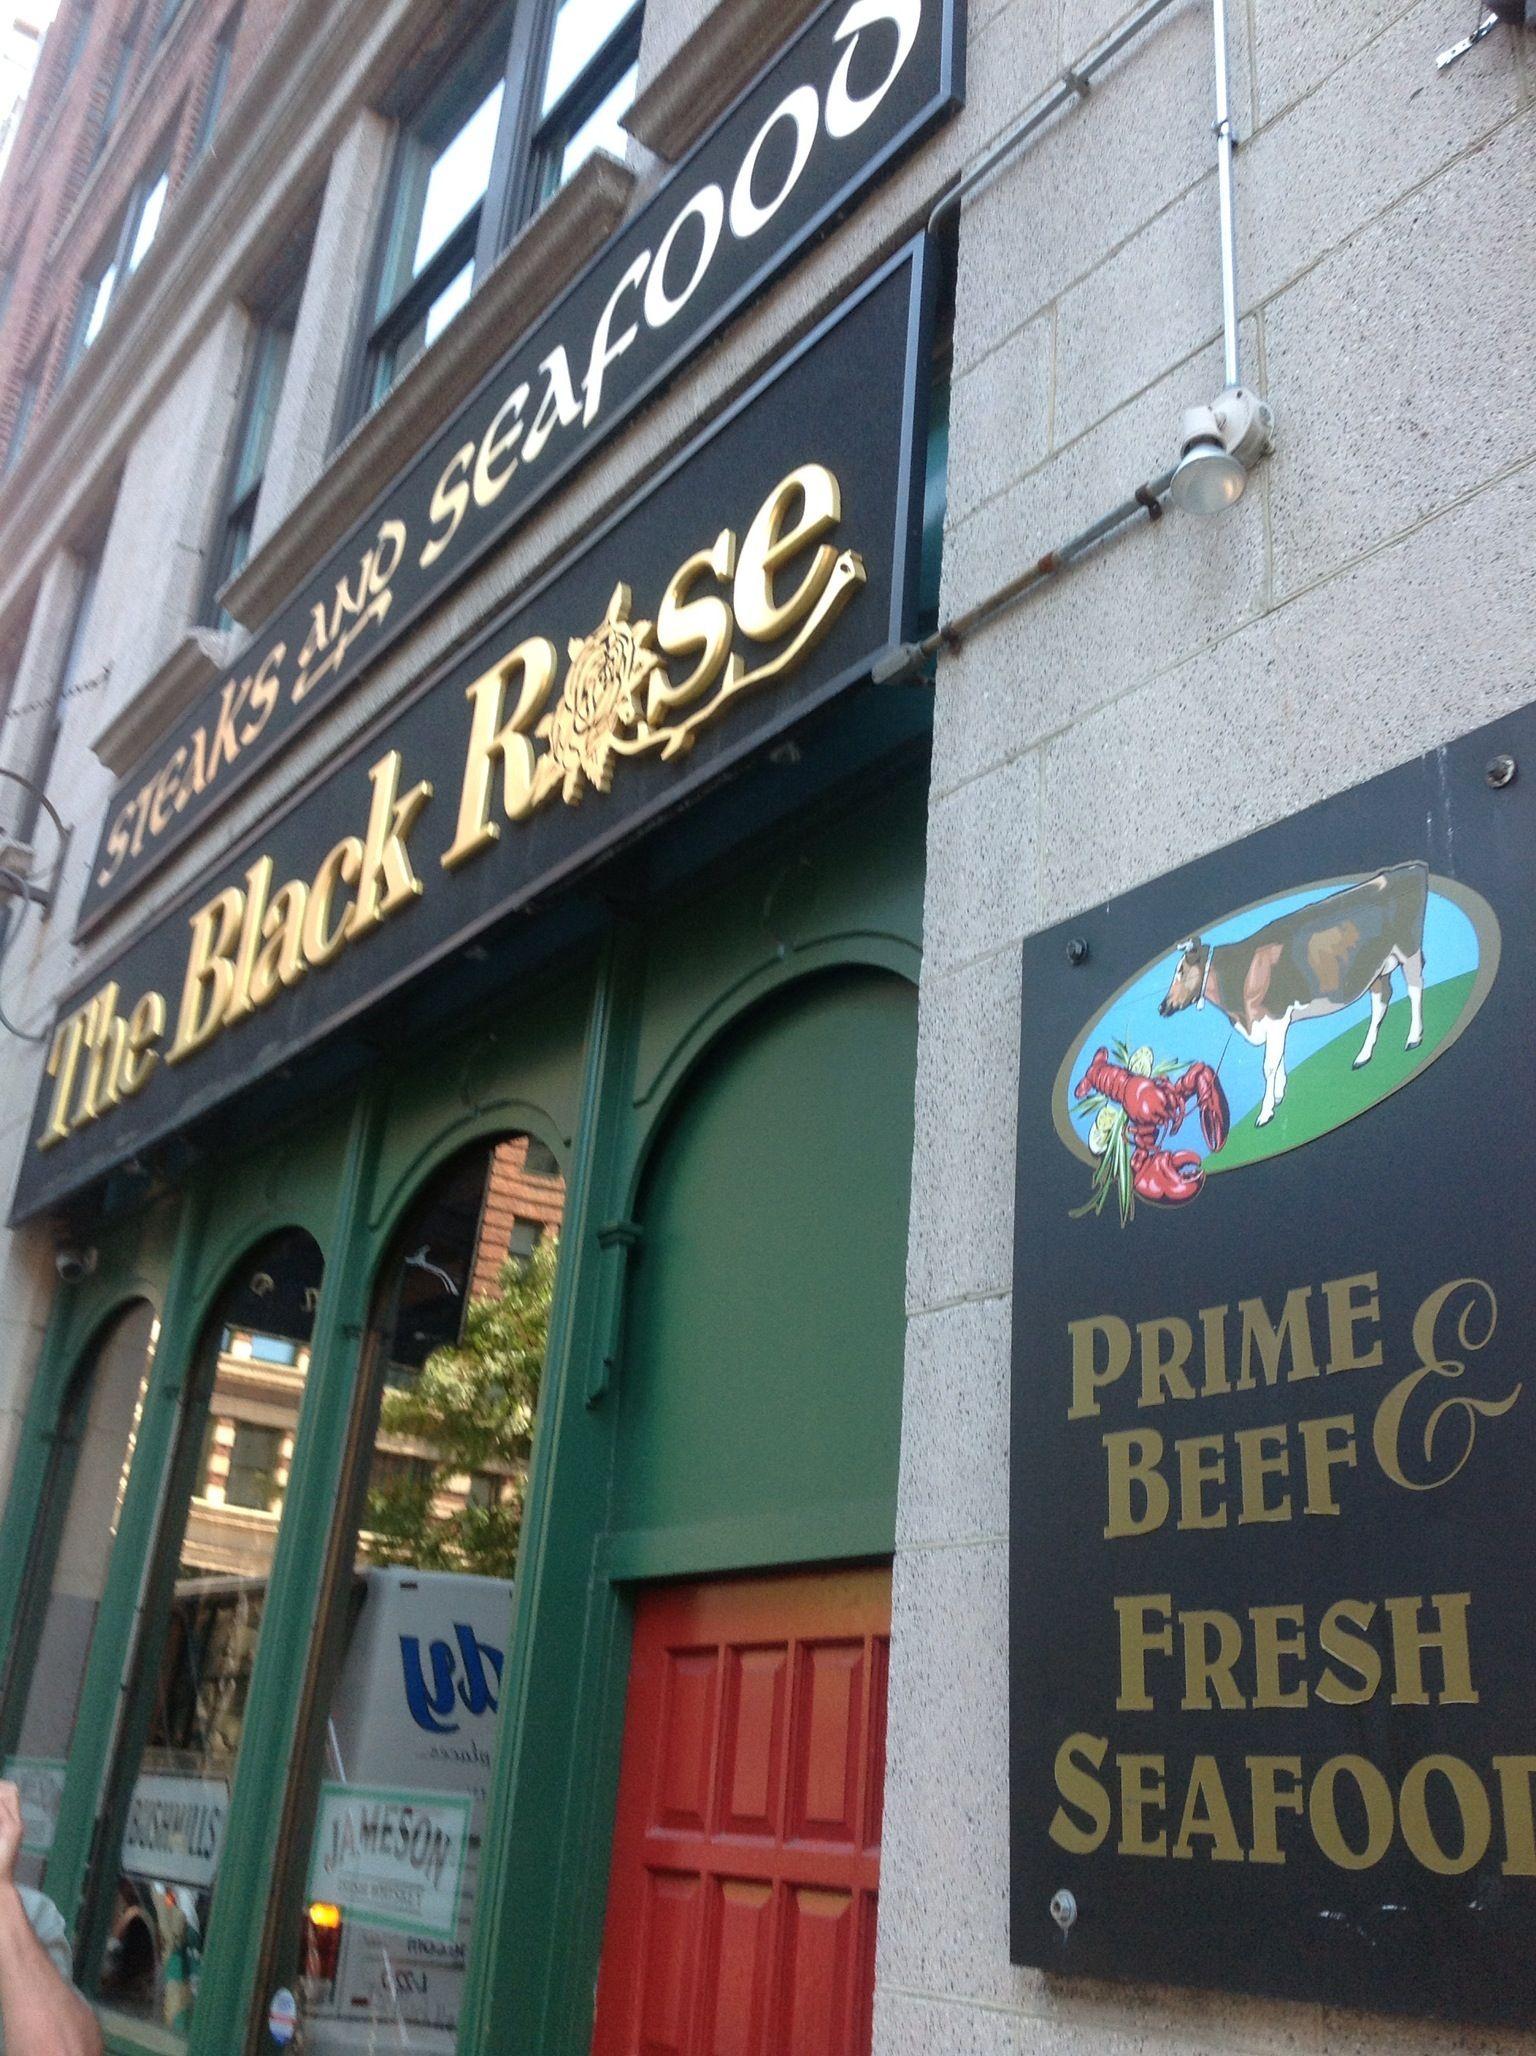 The Black Rose great Pub in Boston near Quincy Market